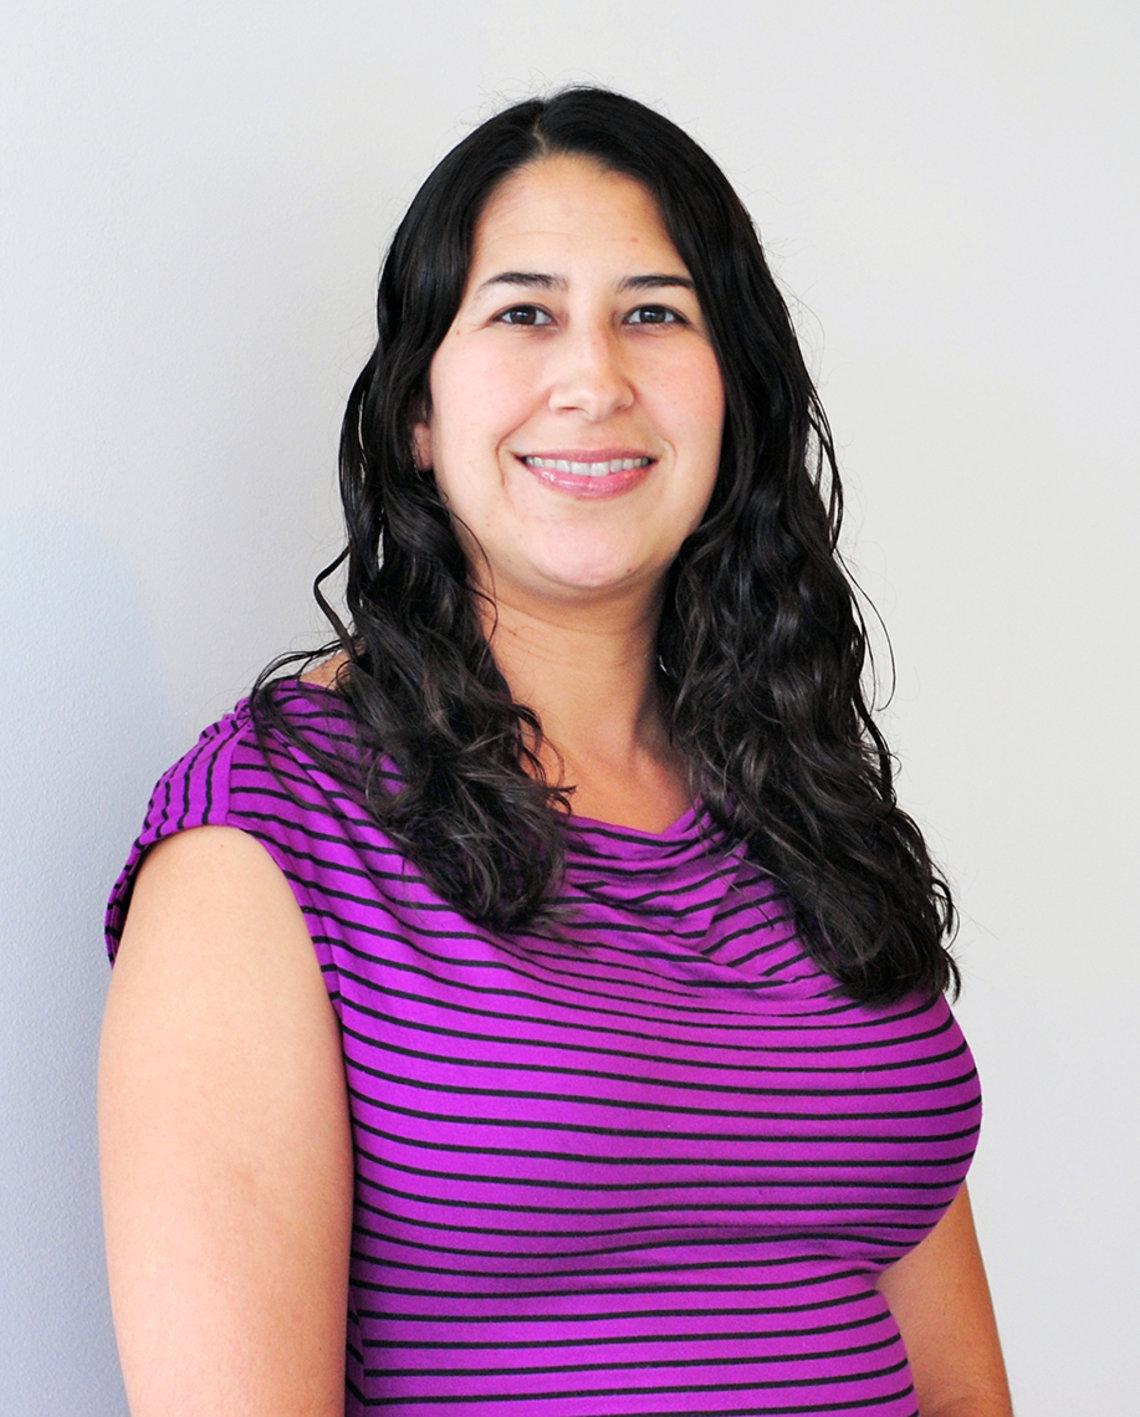 Dr. Desiree Salazar